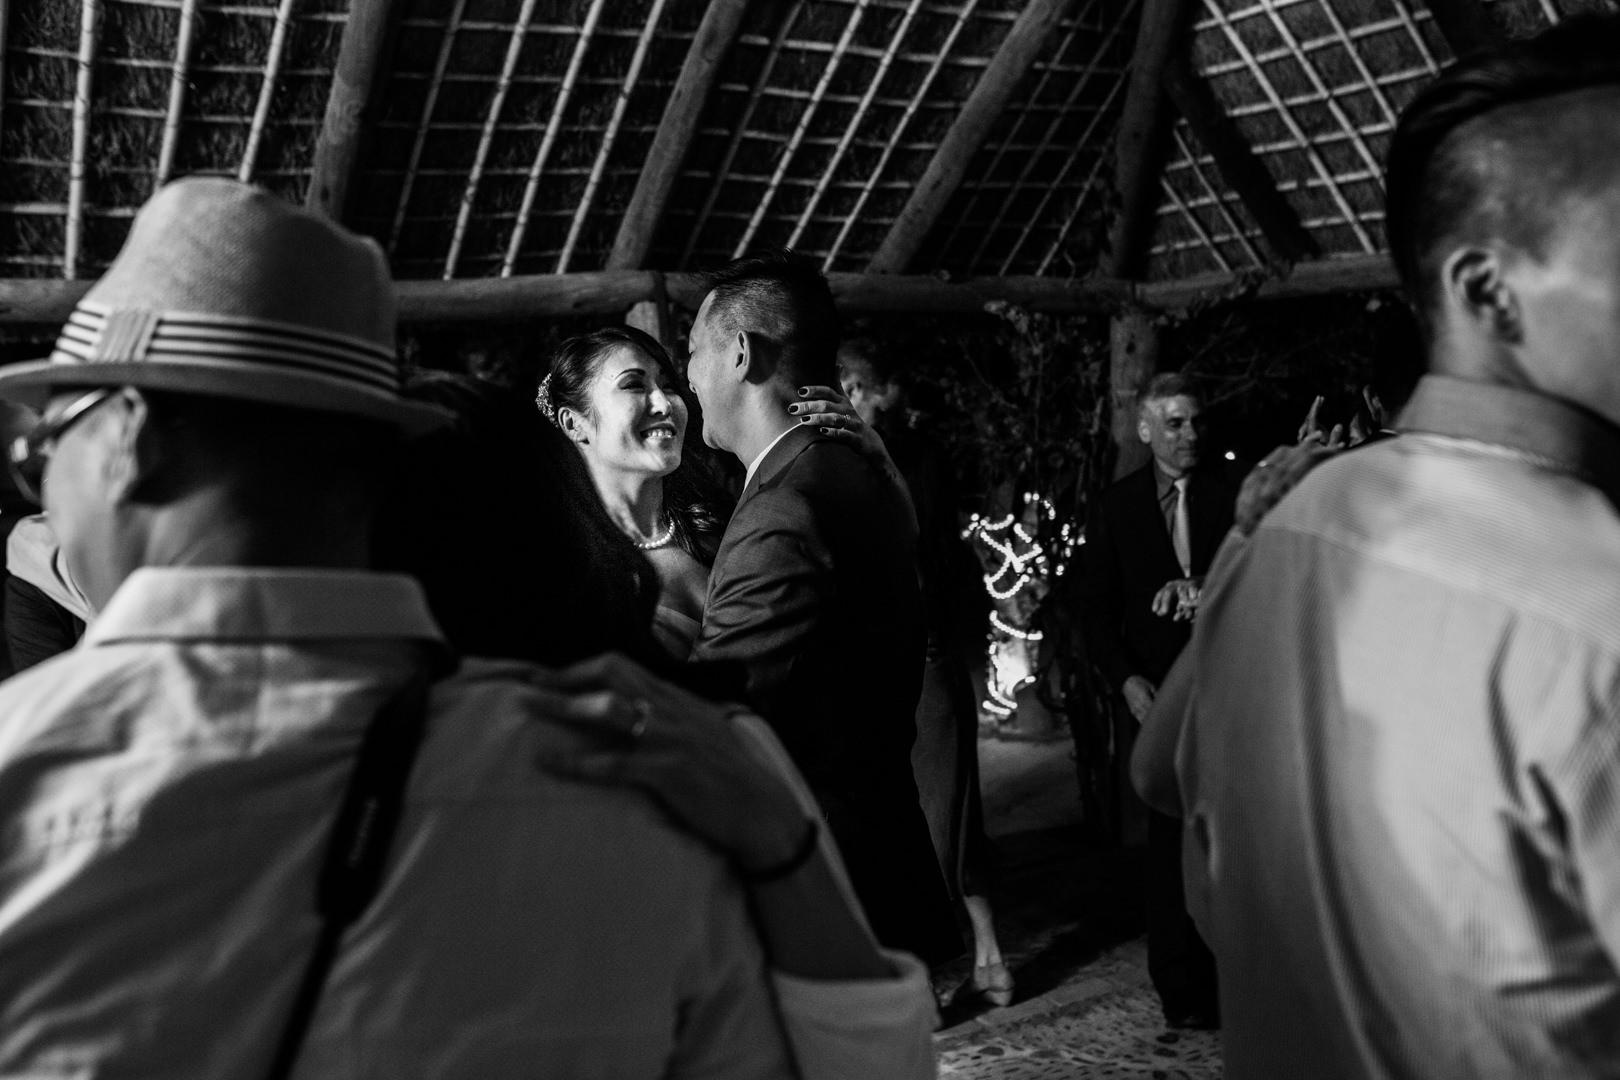 Boda-Hacienda-San-Rafael-Sevilla-engagement-Rafael-Torres-fotografo-bodas-sevilla-madrid-barcelona-wedding-photographer--81.jpg